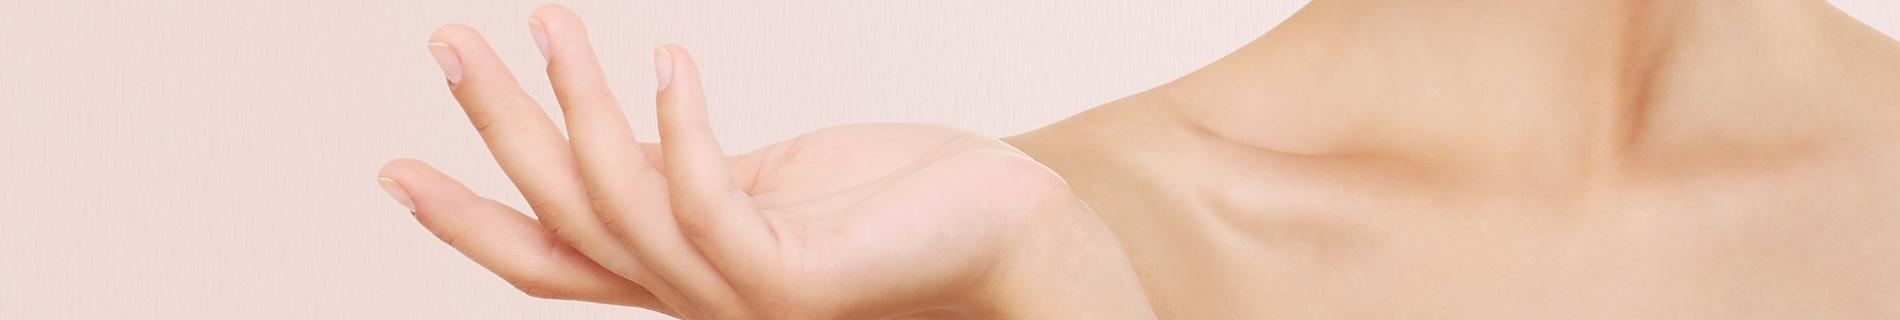 Chirurgie de la main & microchirurgie